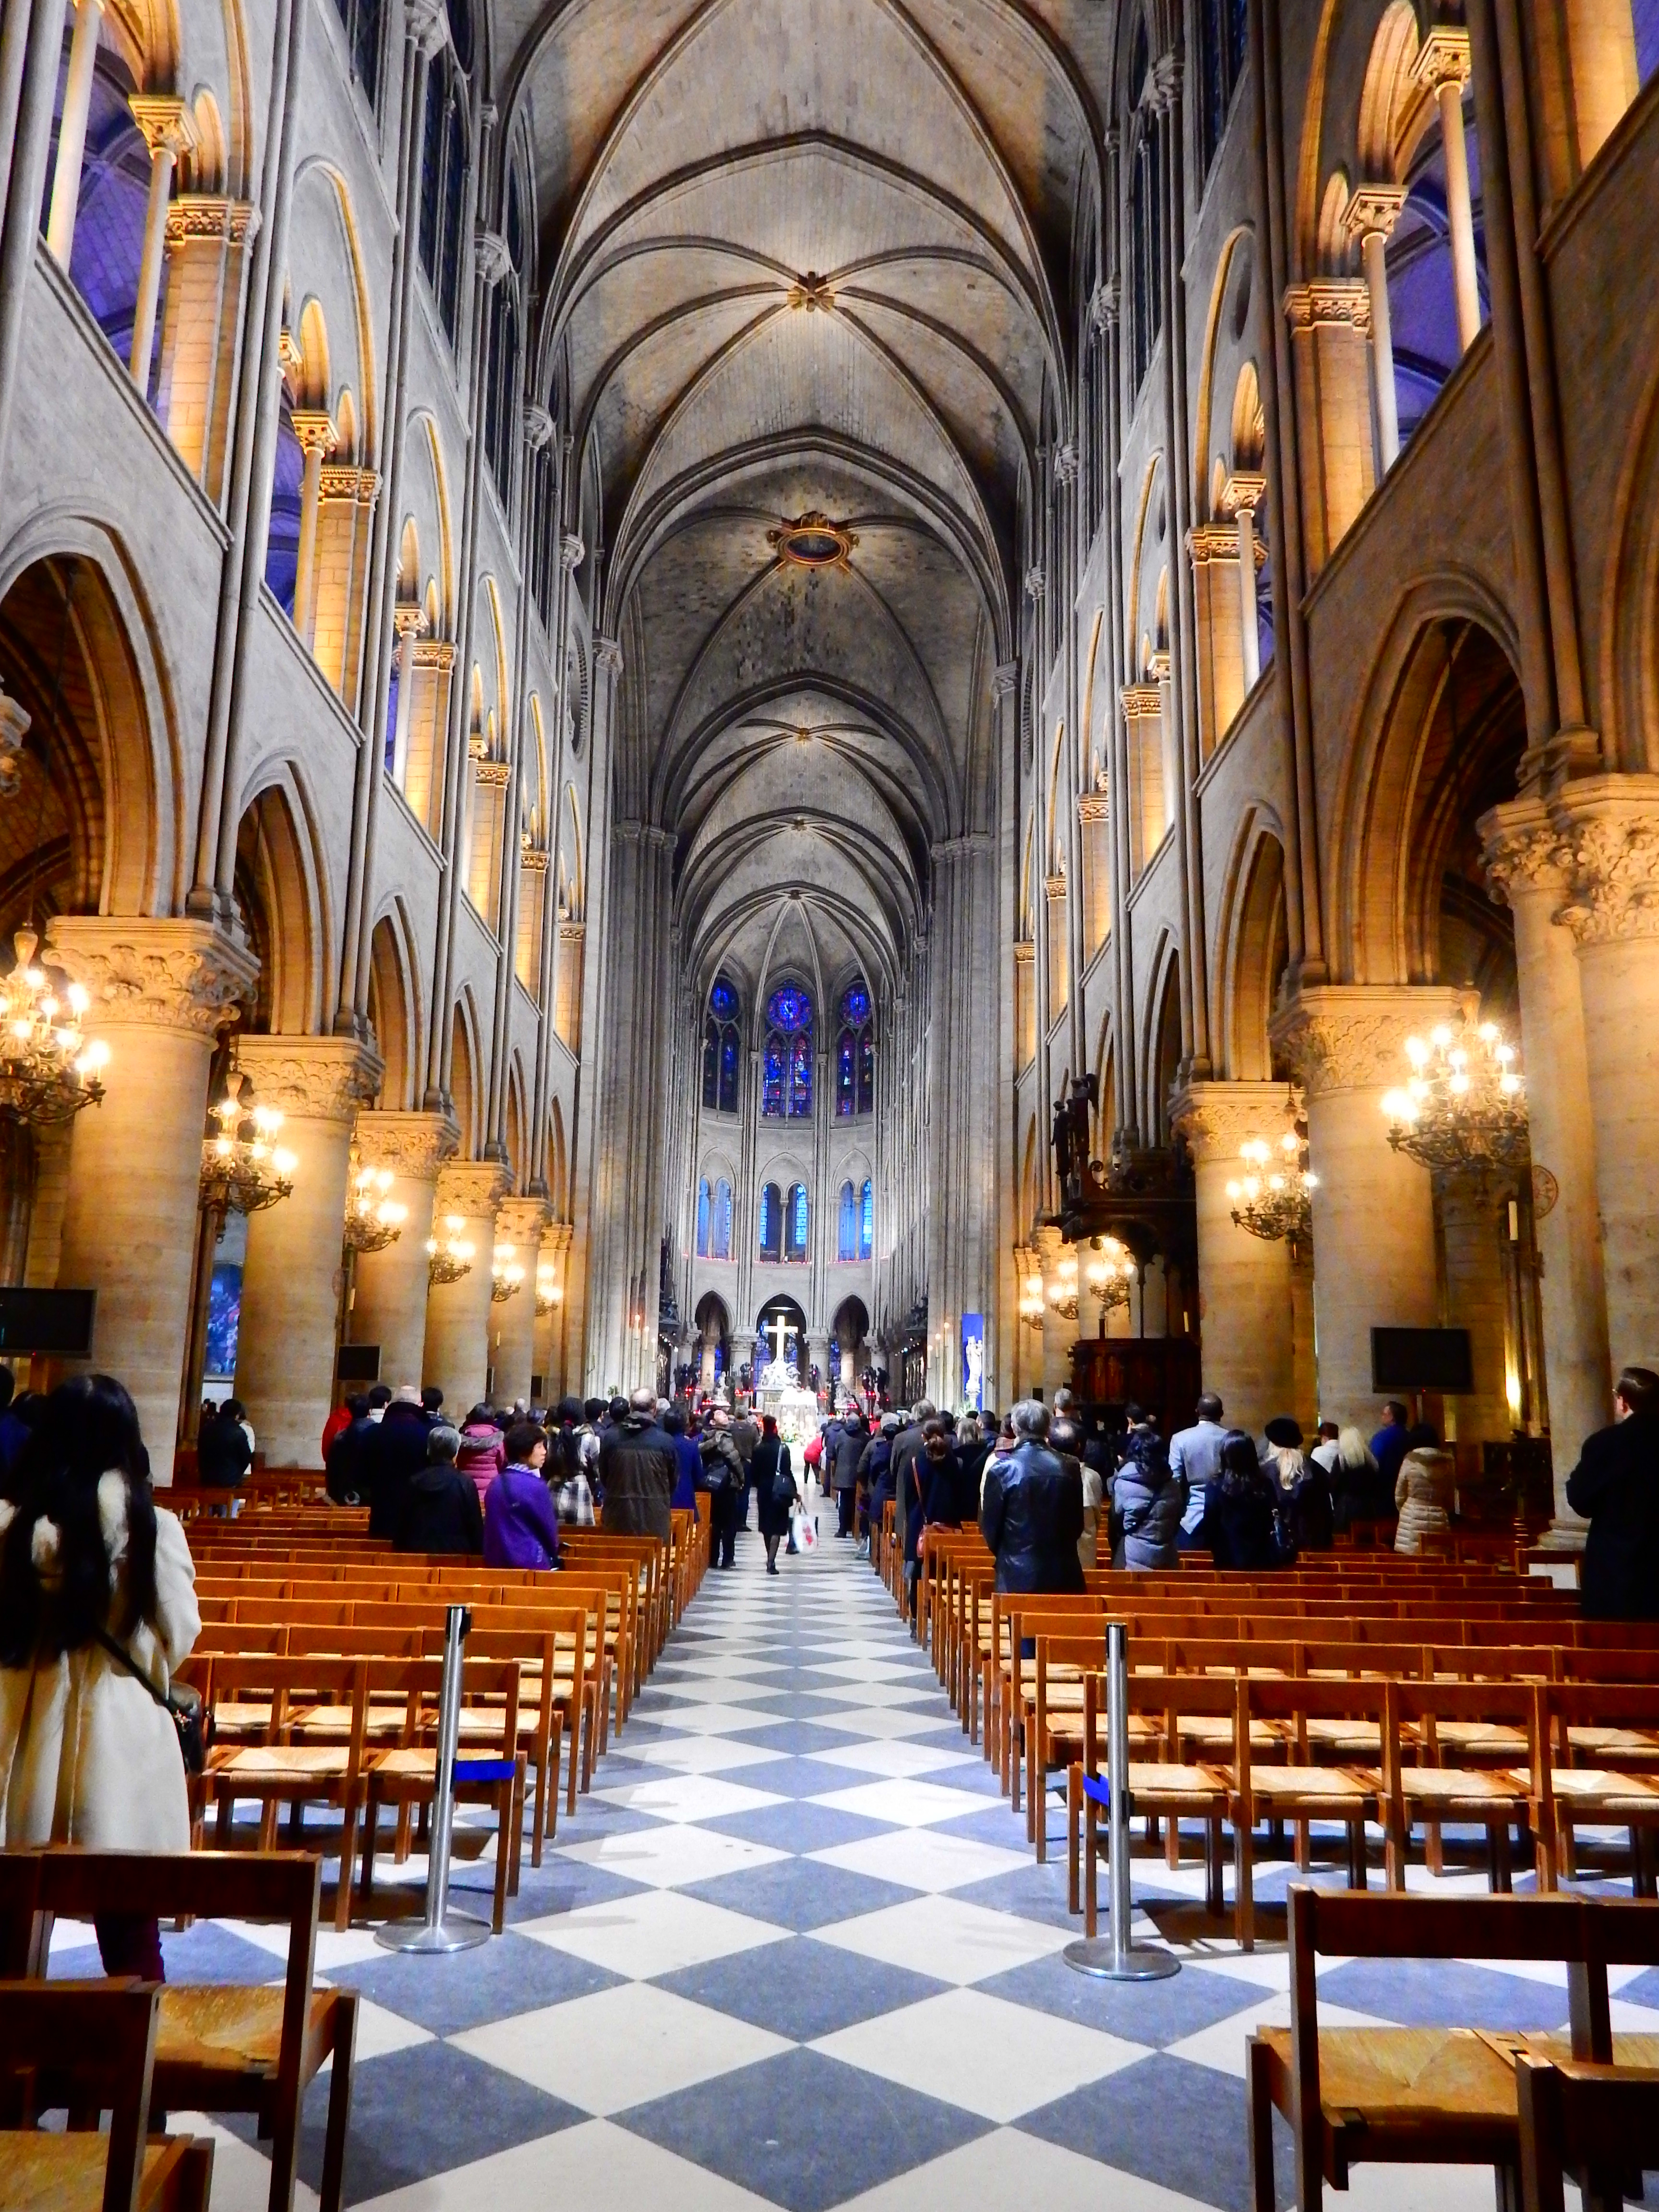 PARIS IMAGES: CHRISTMAS IN NOTRE DAME de PARIS – TOKIDOKI (NOMAD)